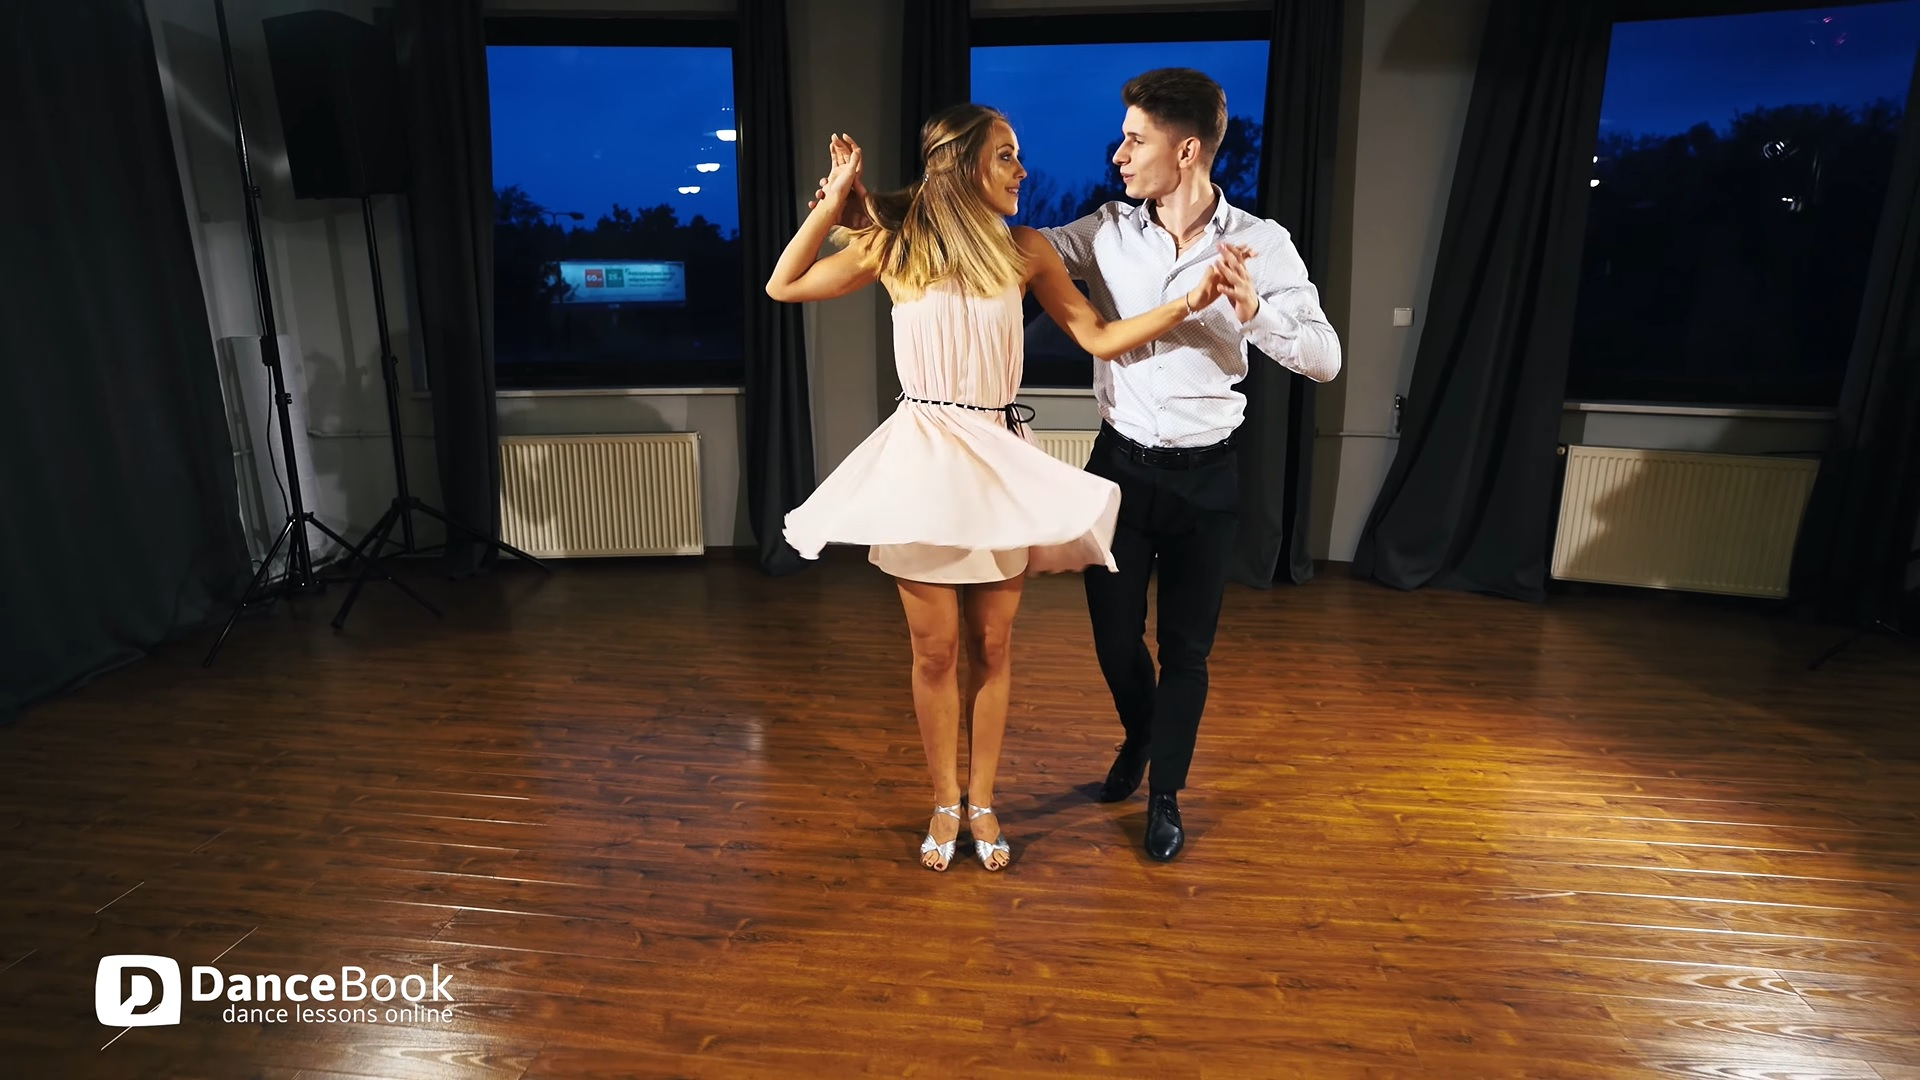 Dan + Shay - Speechless - Wedding Dance Choreography - Pierwszy Taniec